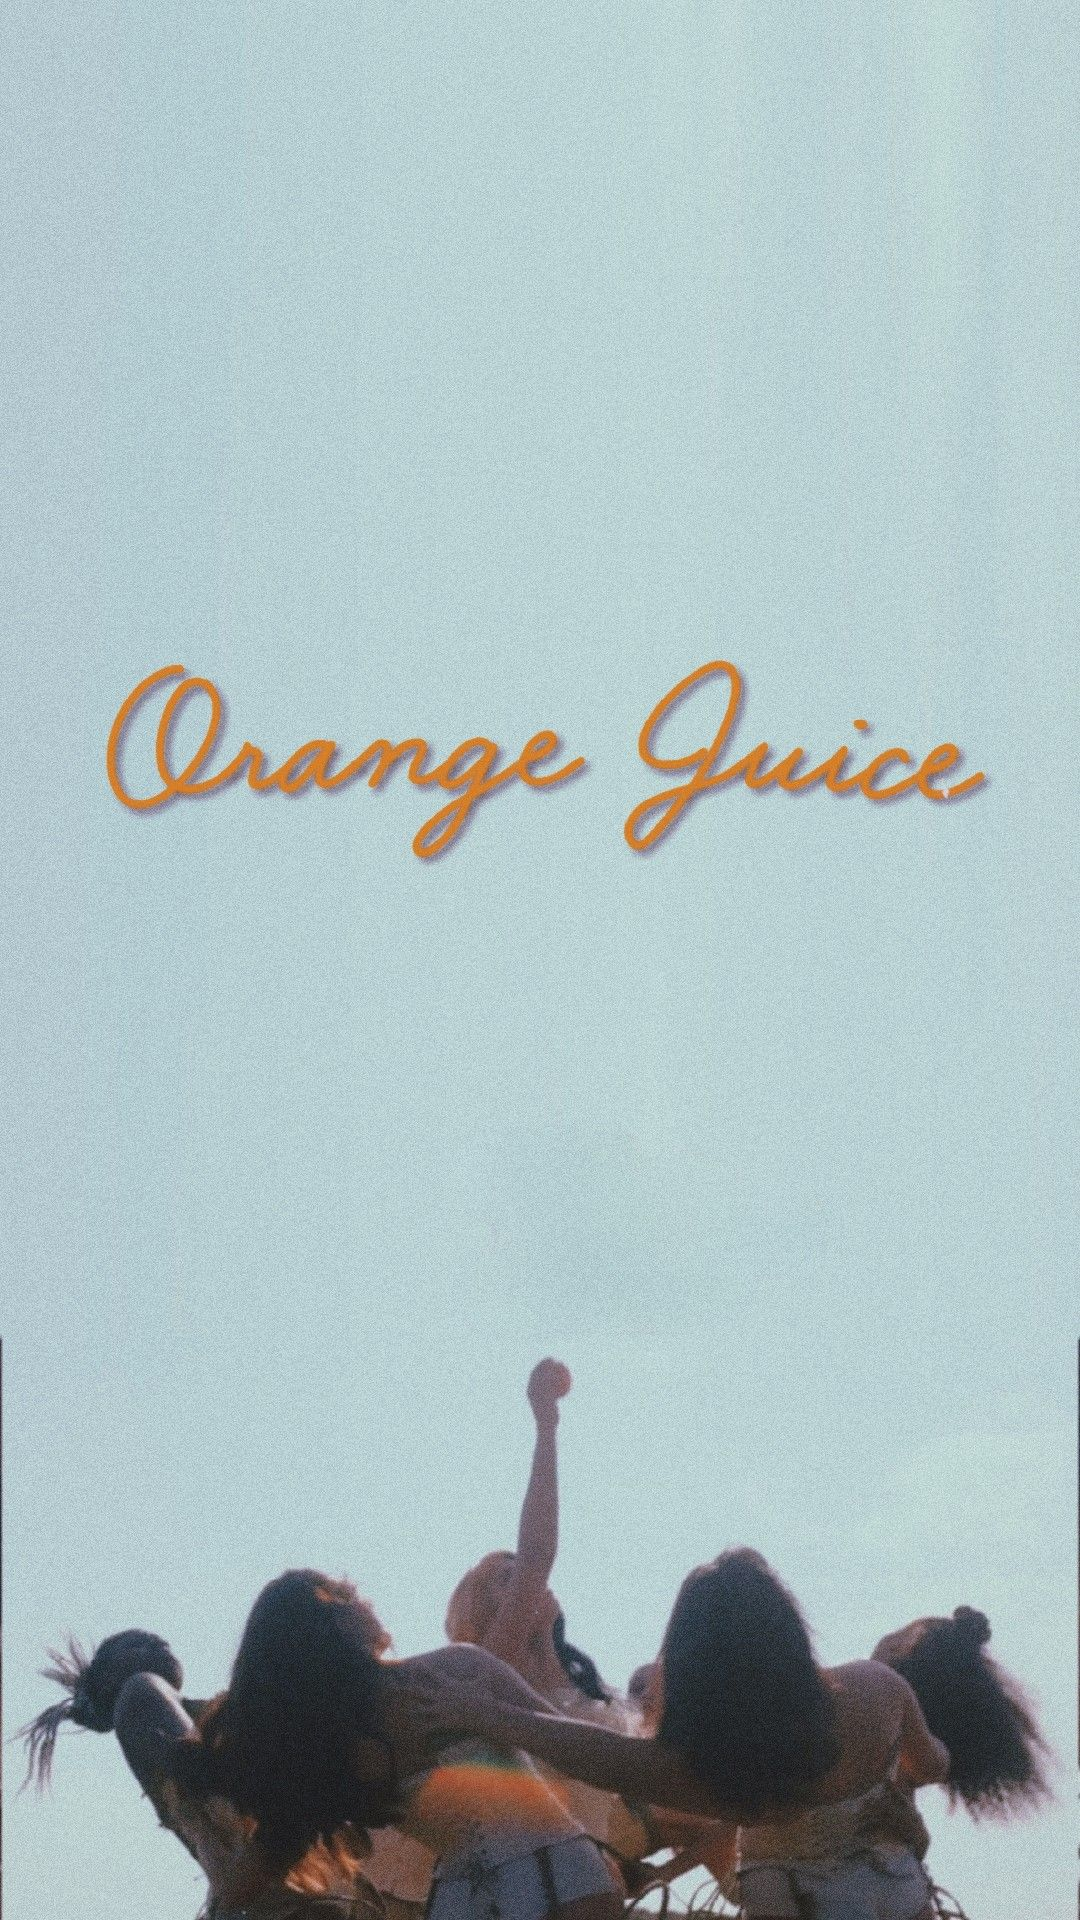 Orange Juice Melanie Martinez Lyrics Melanie Martinez Crybaby Melanie Martinez